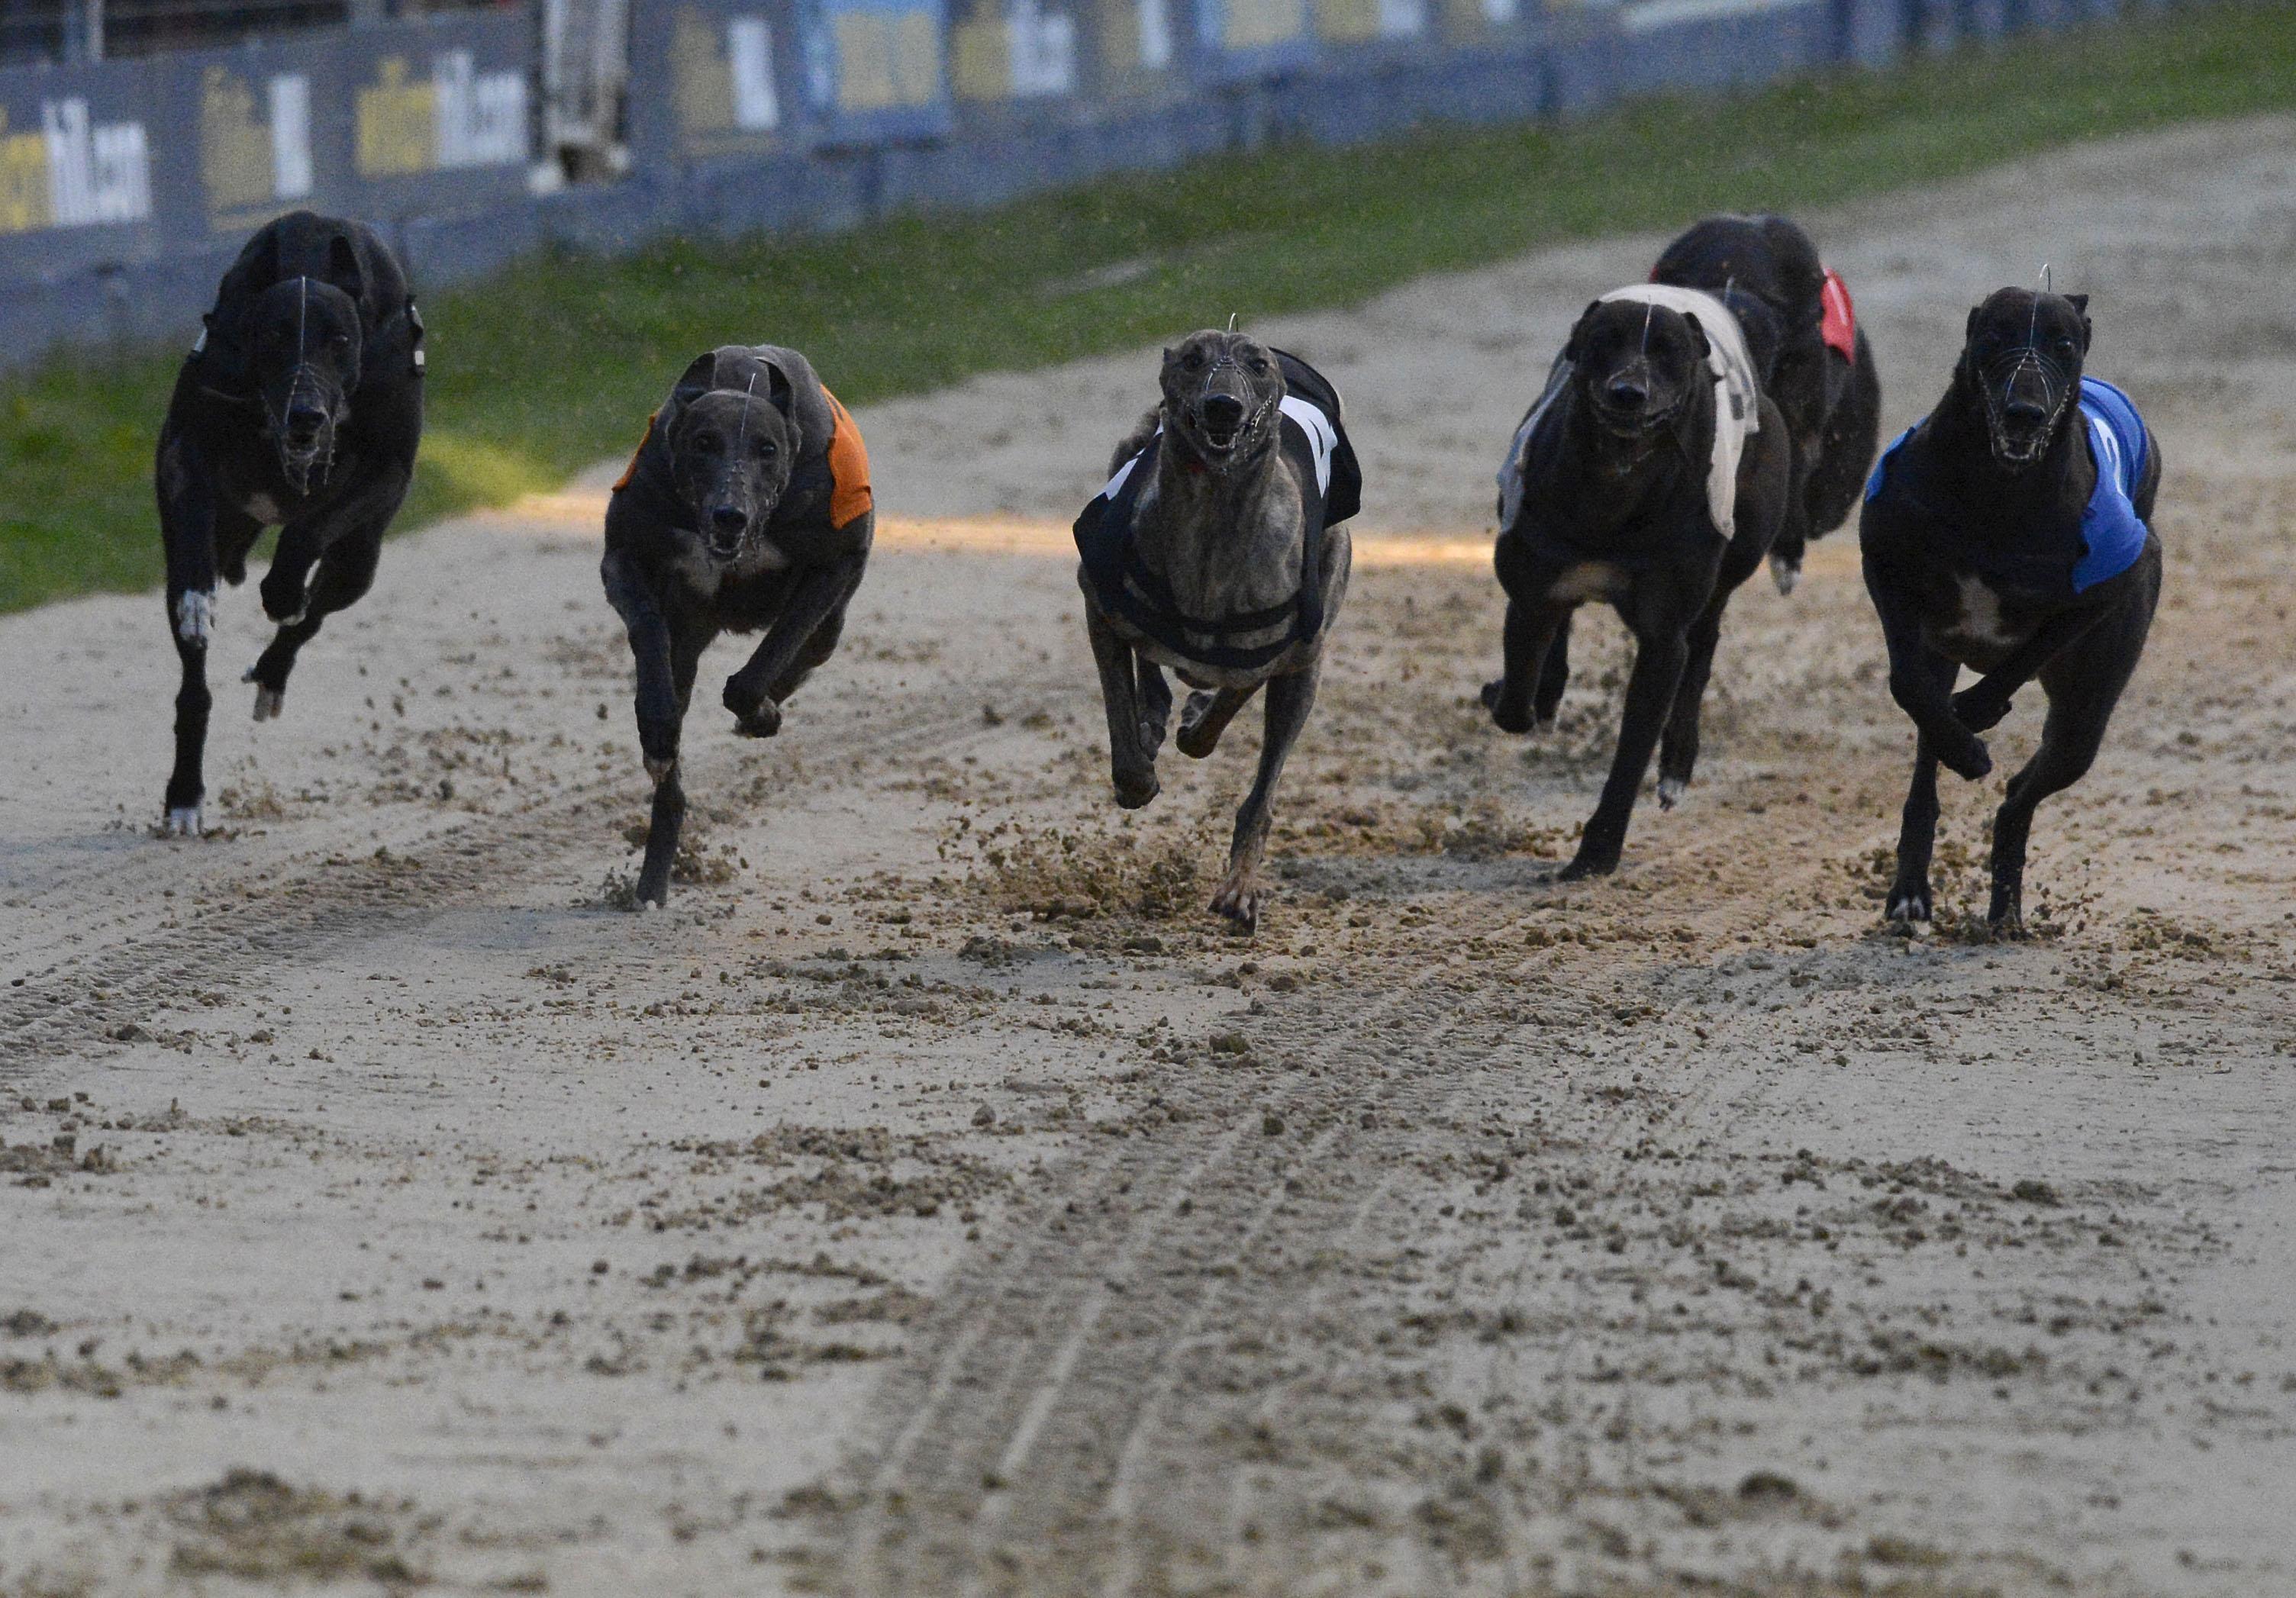 Greyhound st leger bettingadvice real world sports betting